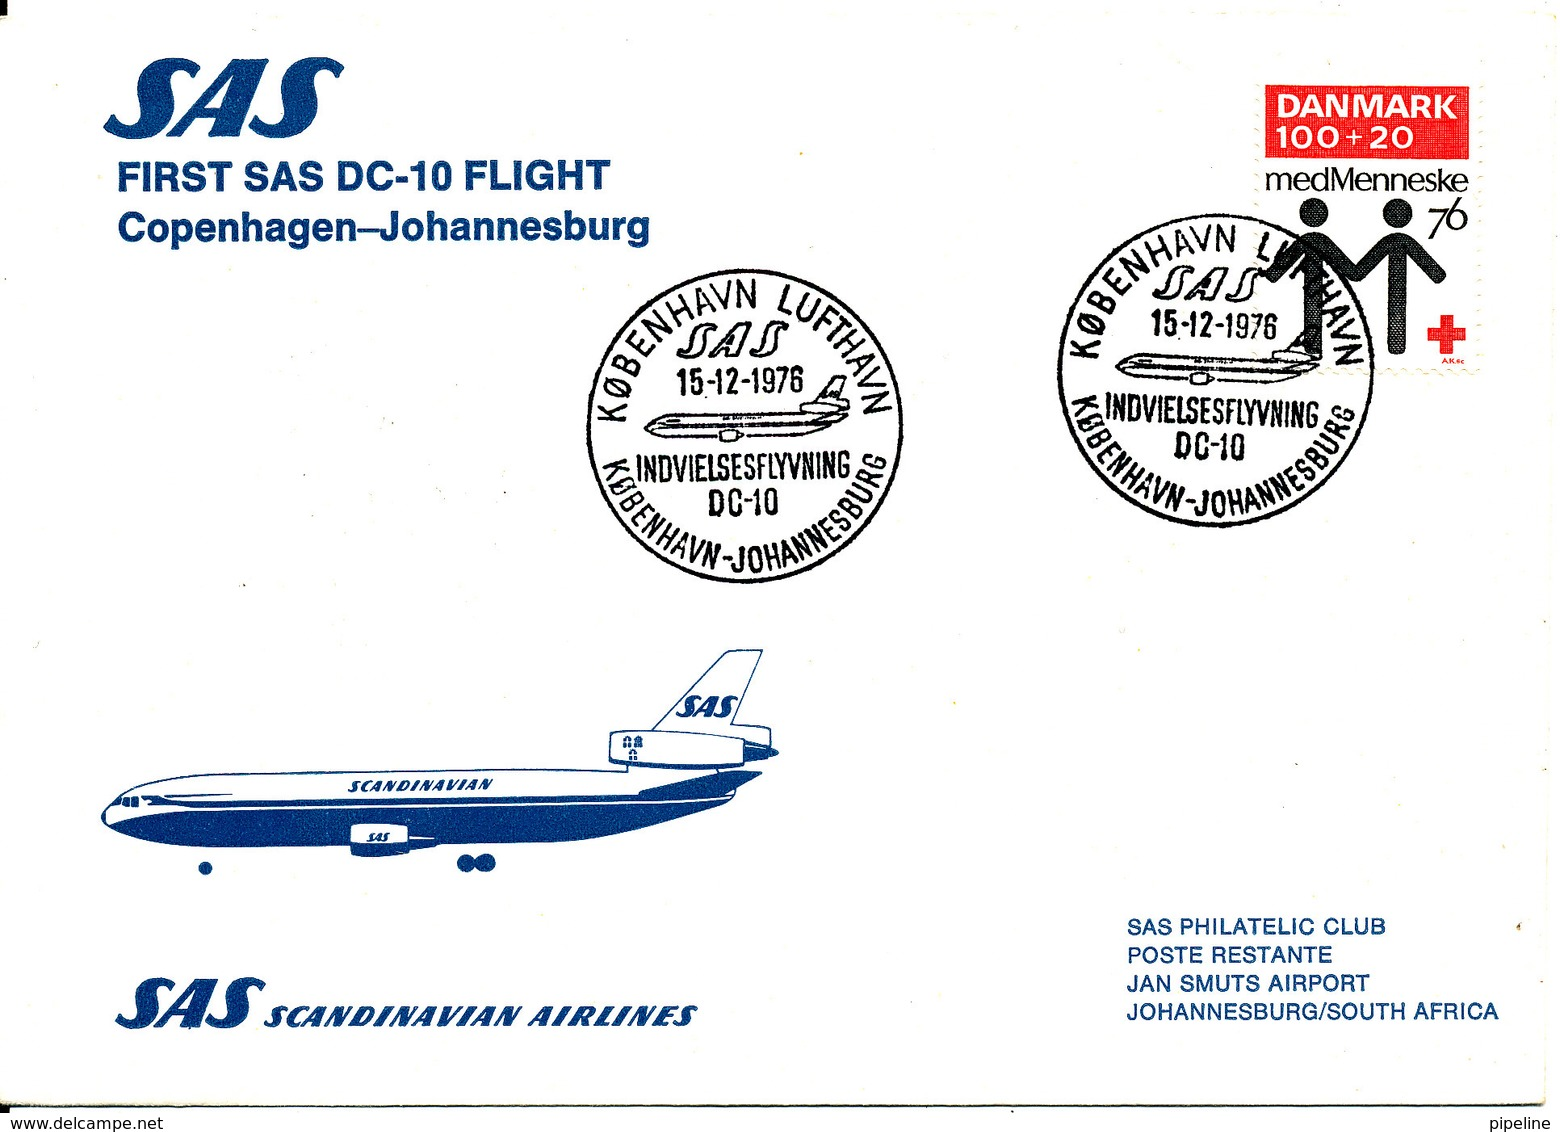 Denmark SAS First Flight Copenhagen Johannesburg DC-10 15-12-1976 - Denmark